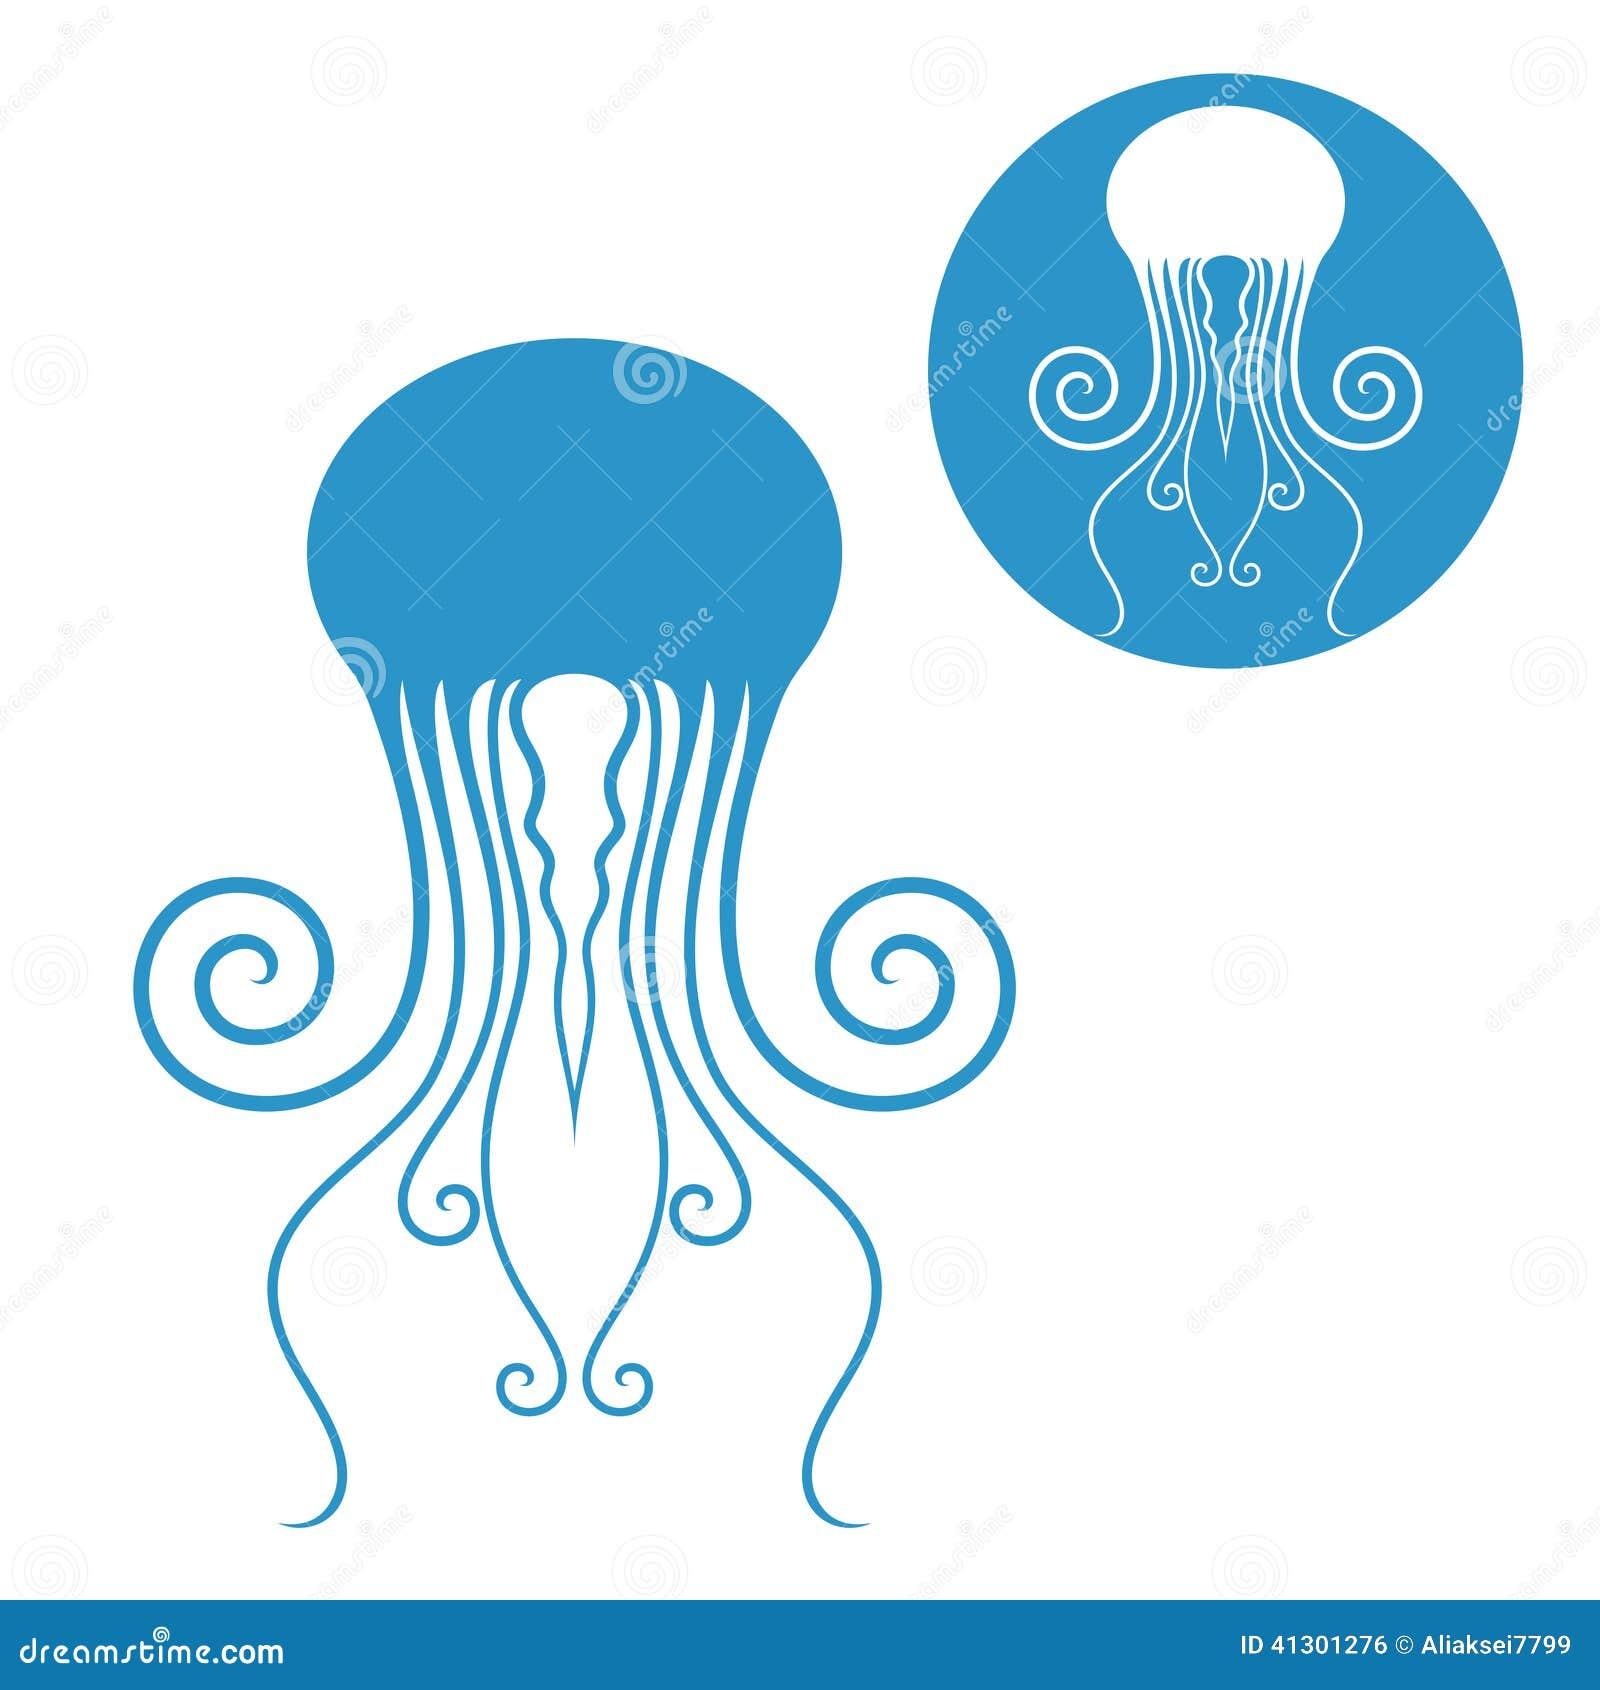 Jellyfish Vector vector jellyfish icon stock vector - image: 41952019